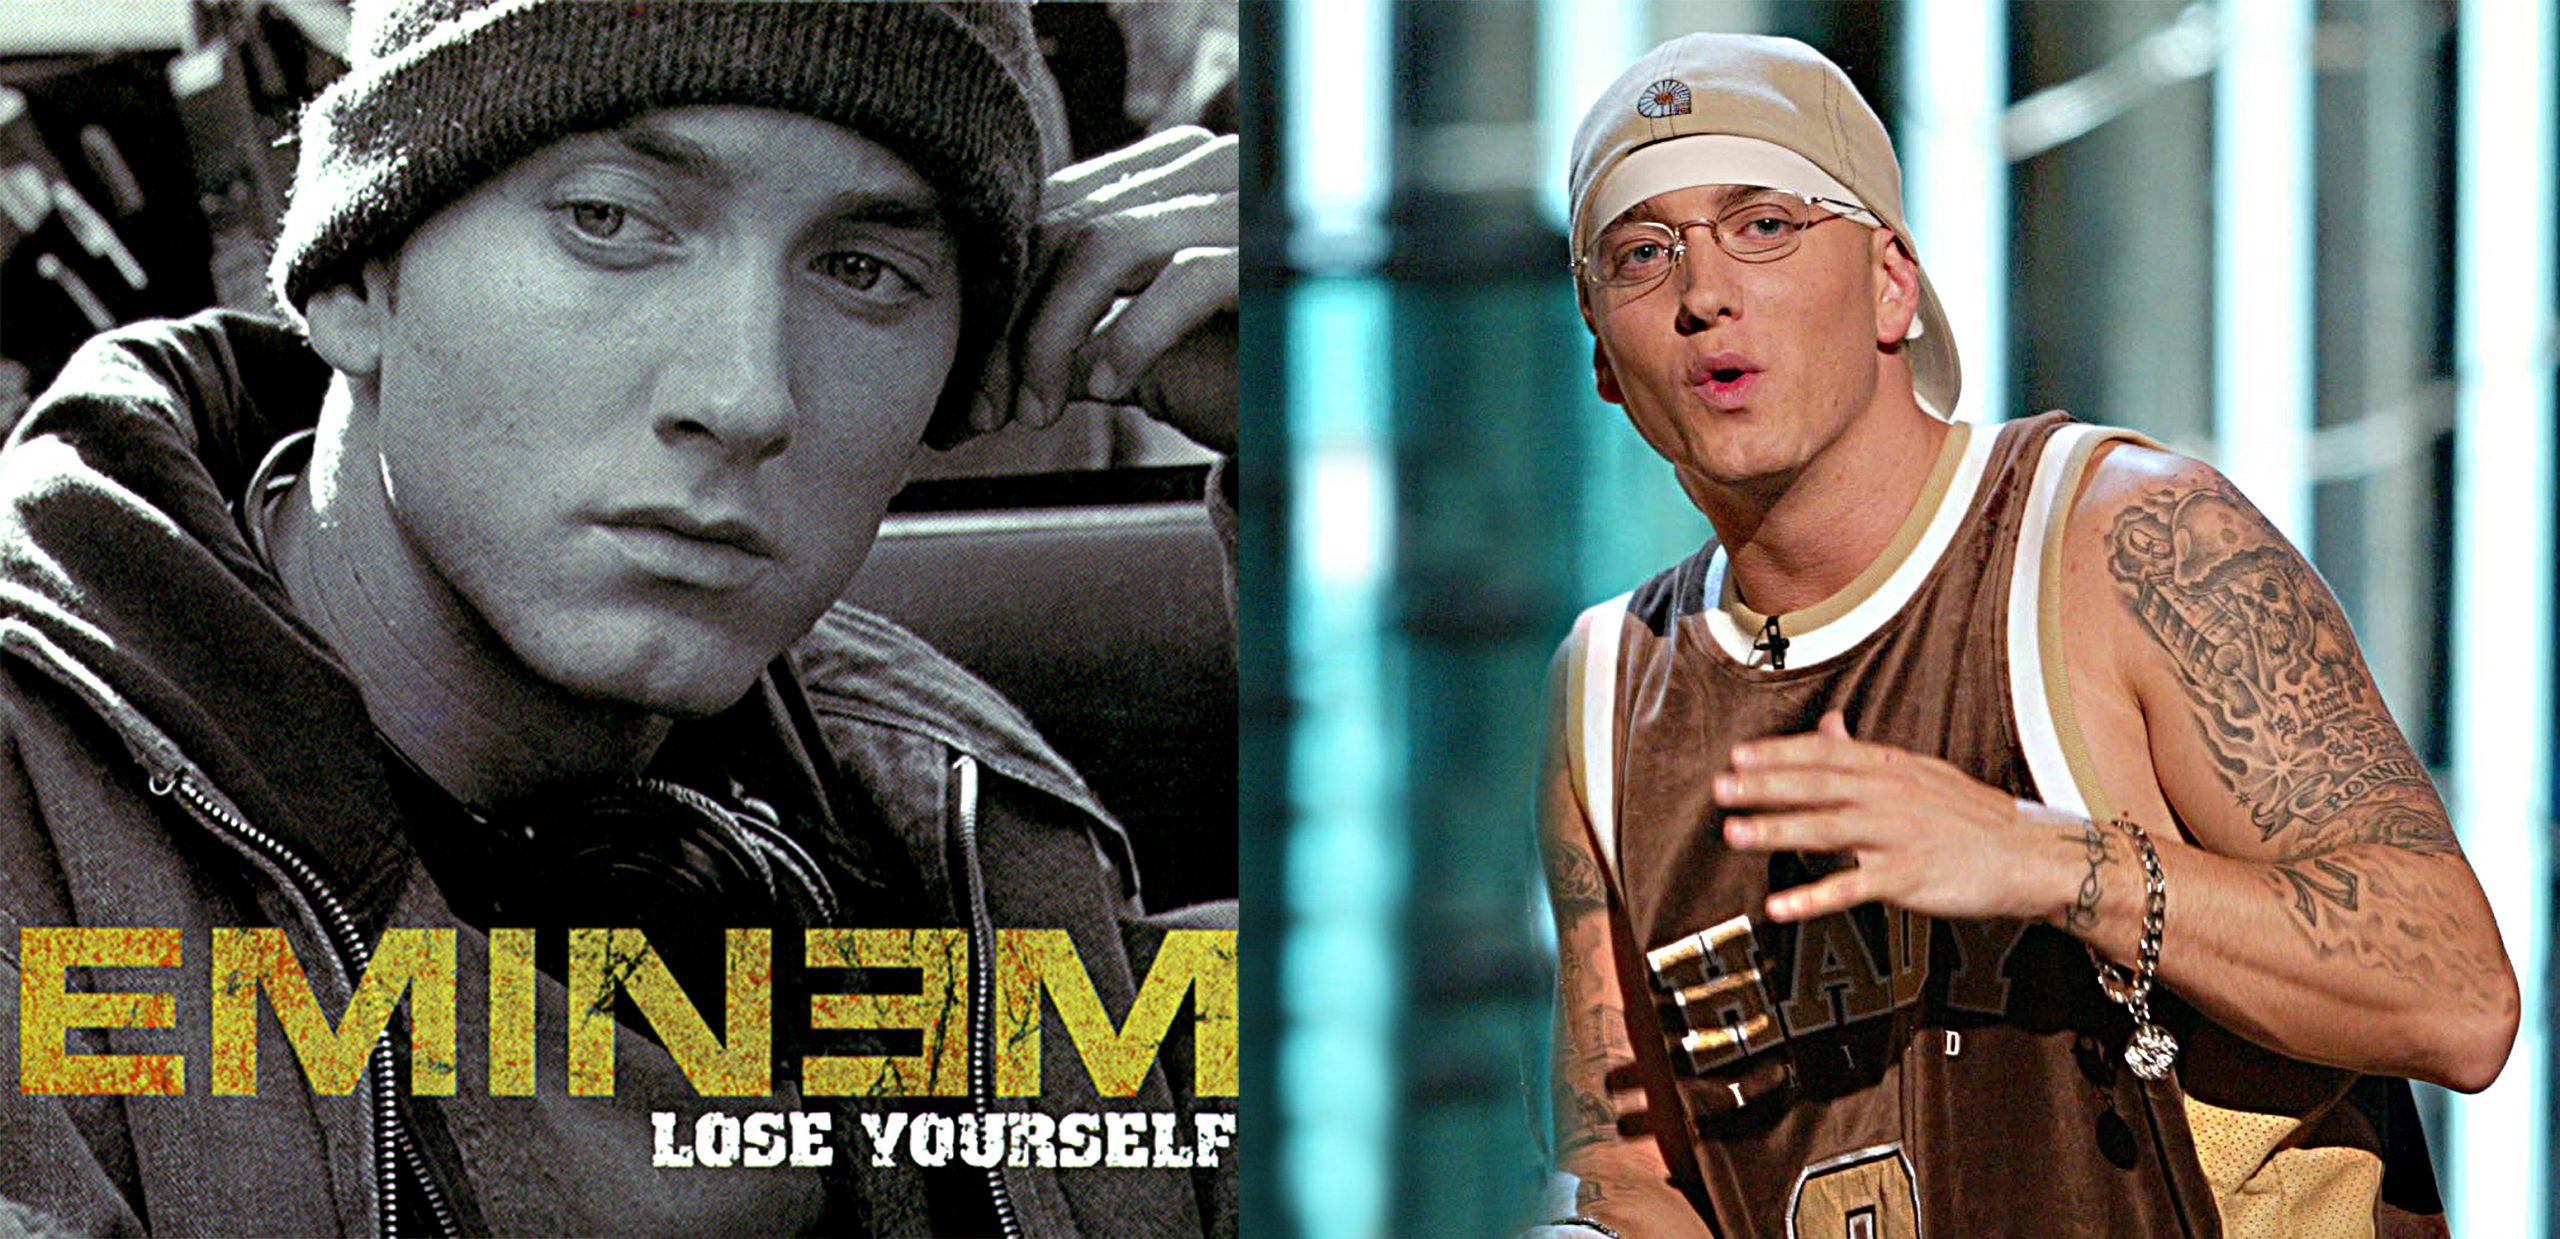 eminem-lose-yourself-oscar-academy-award